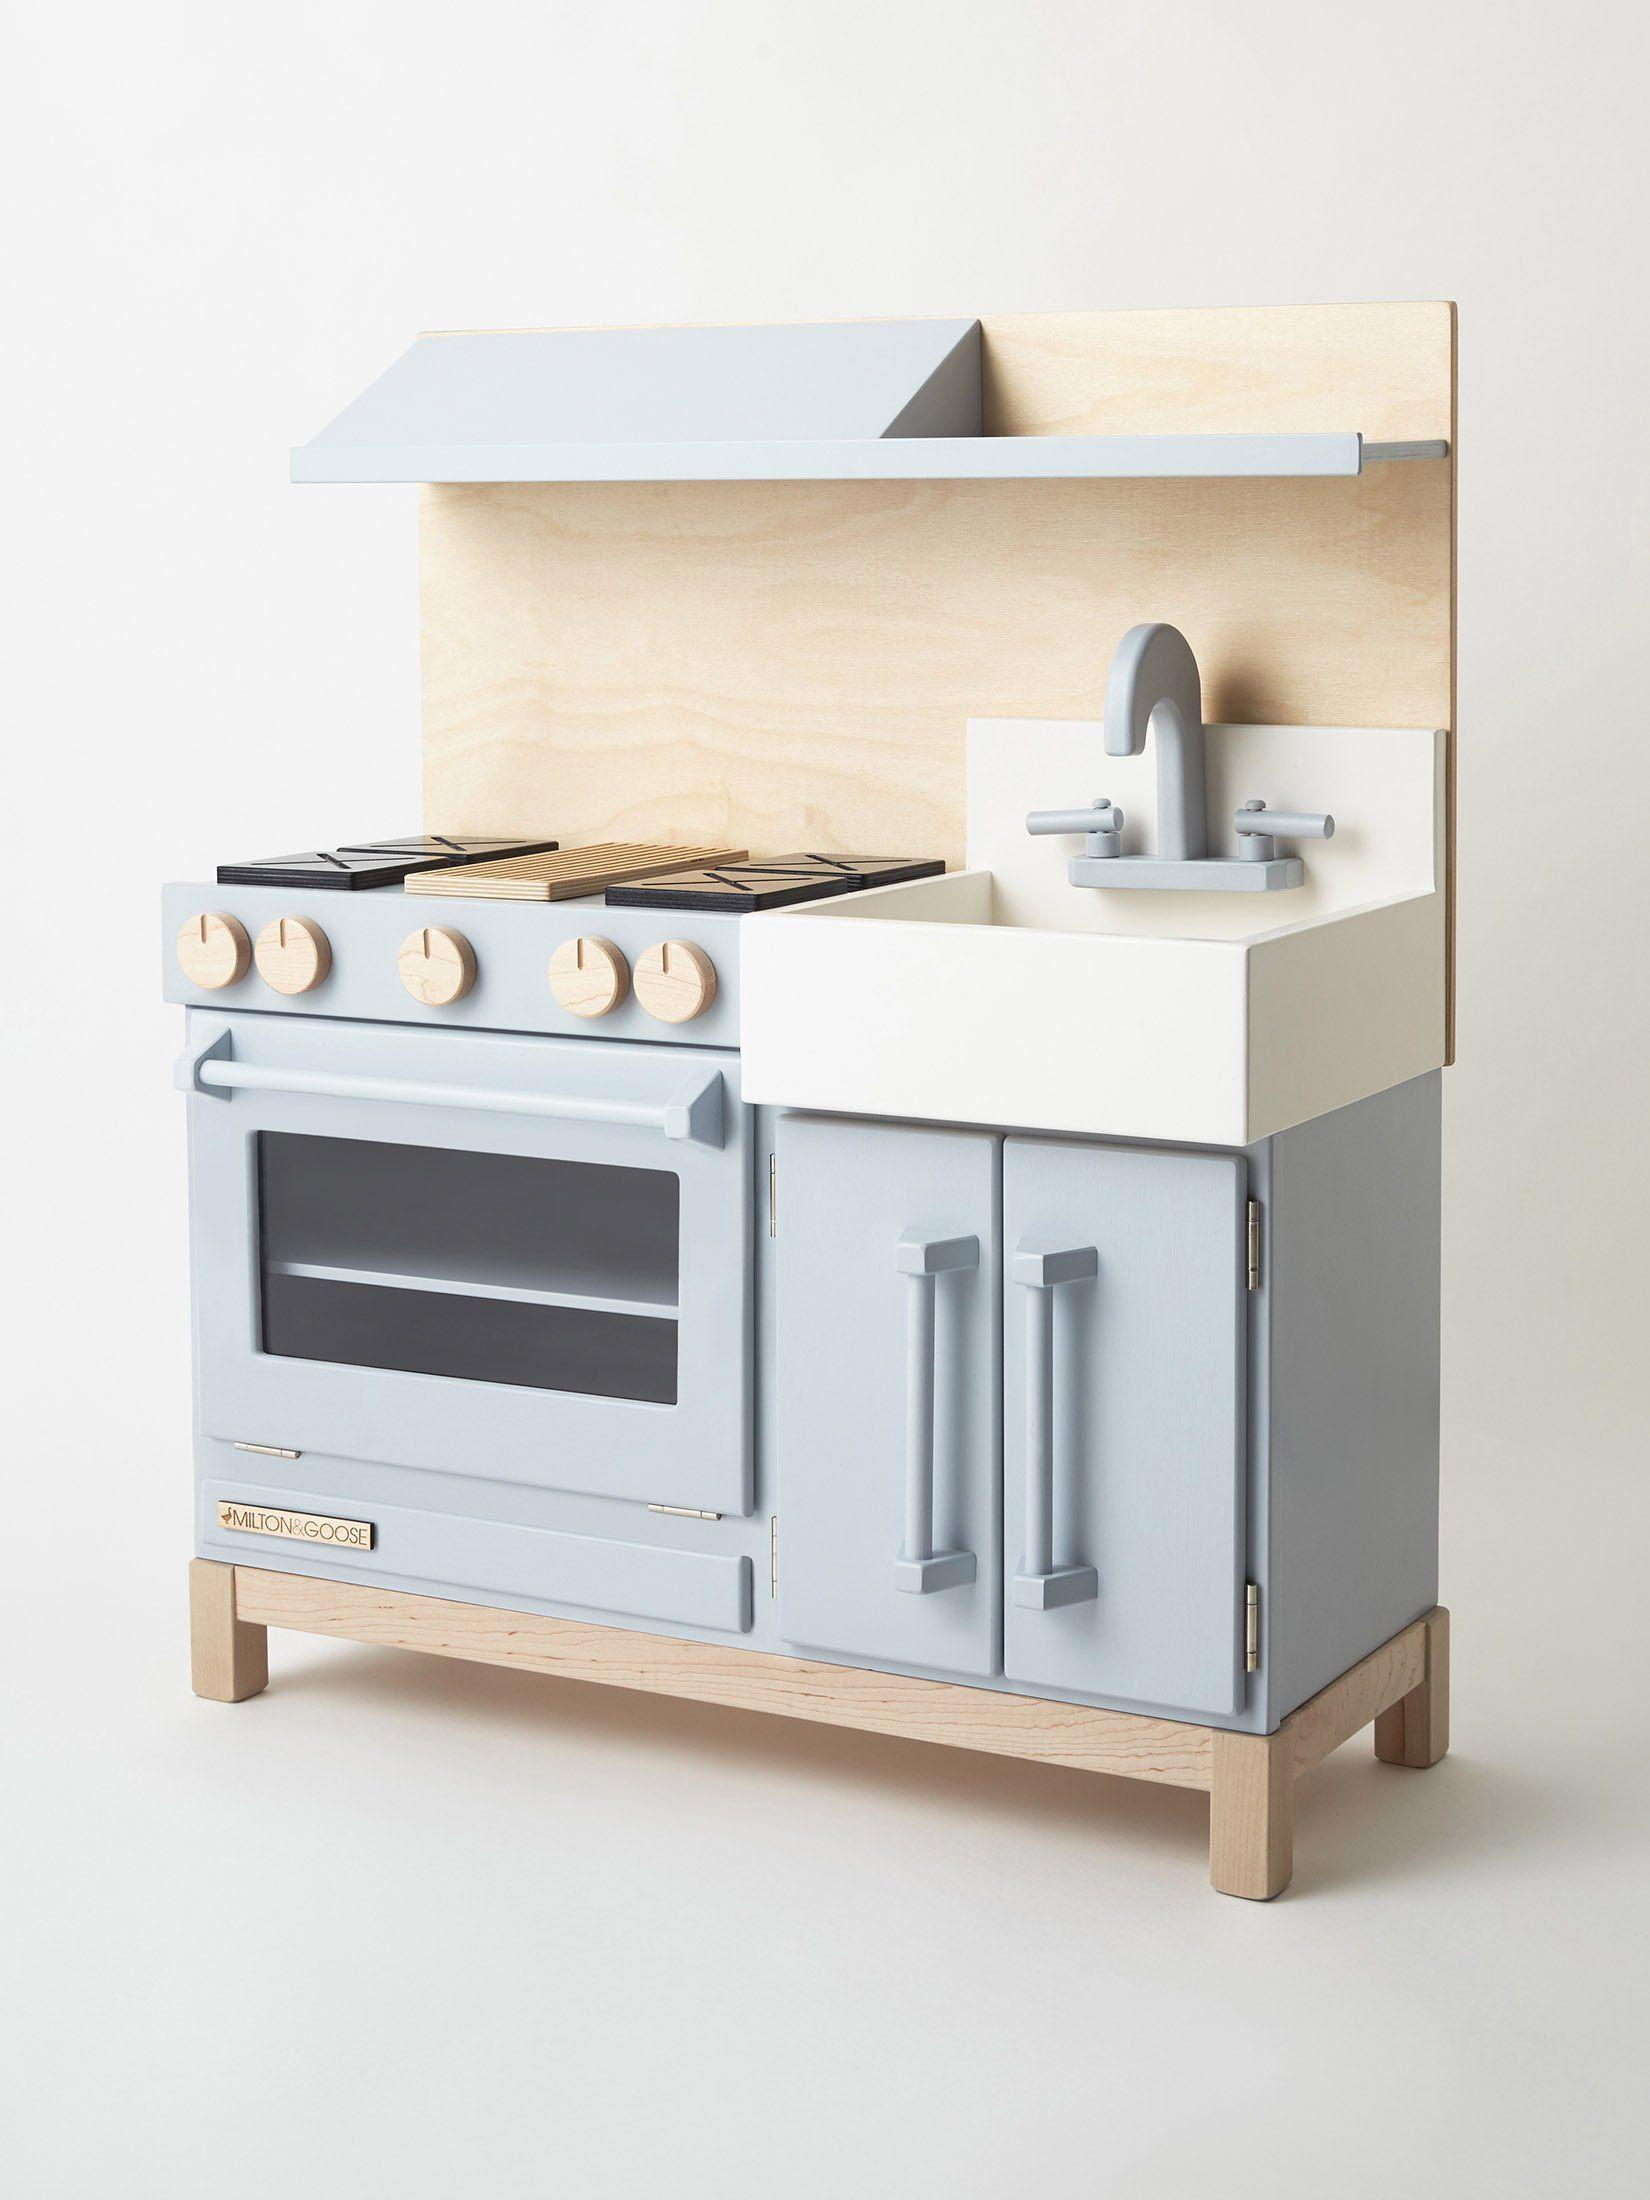 Montessori Play Kitchen | Wooden kitchen and Kitchens